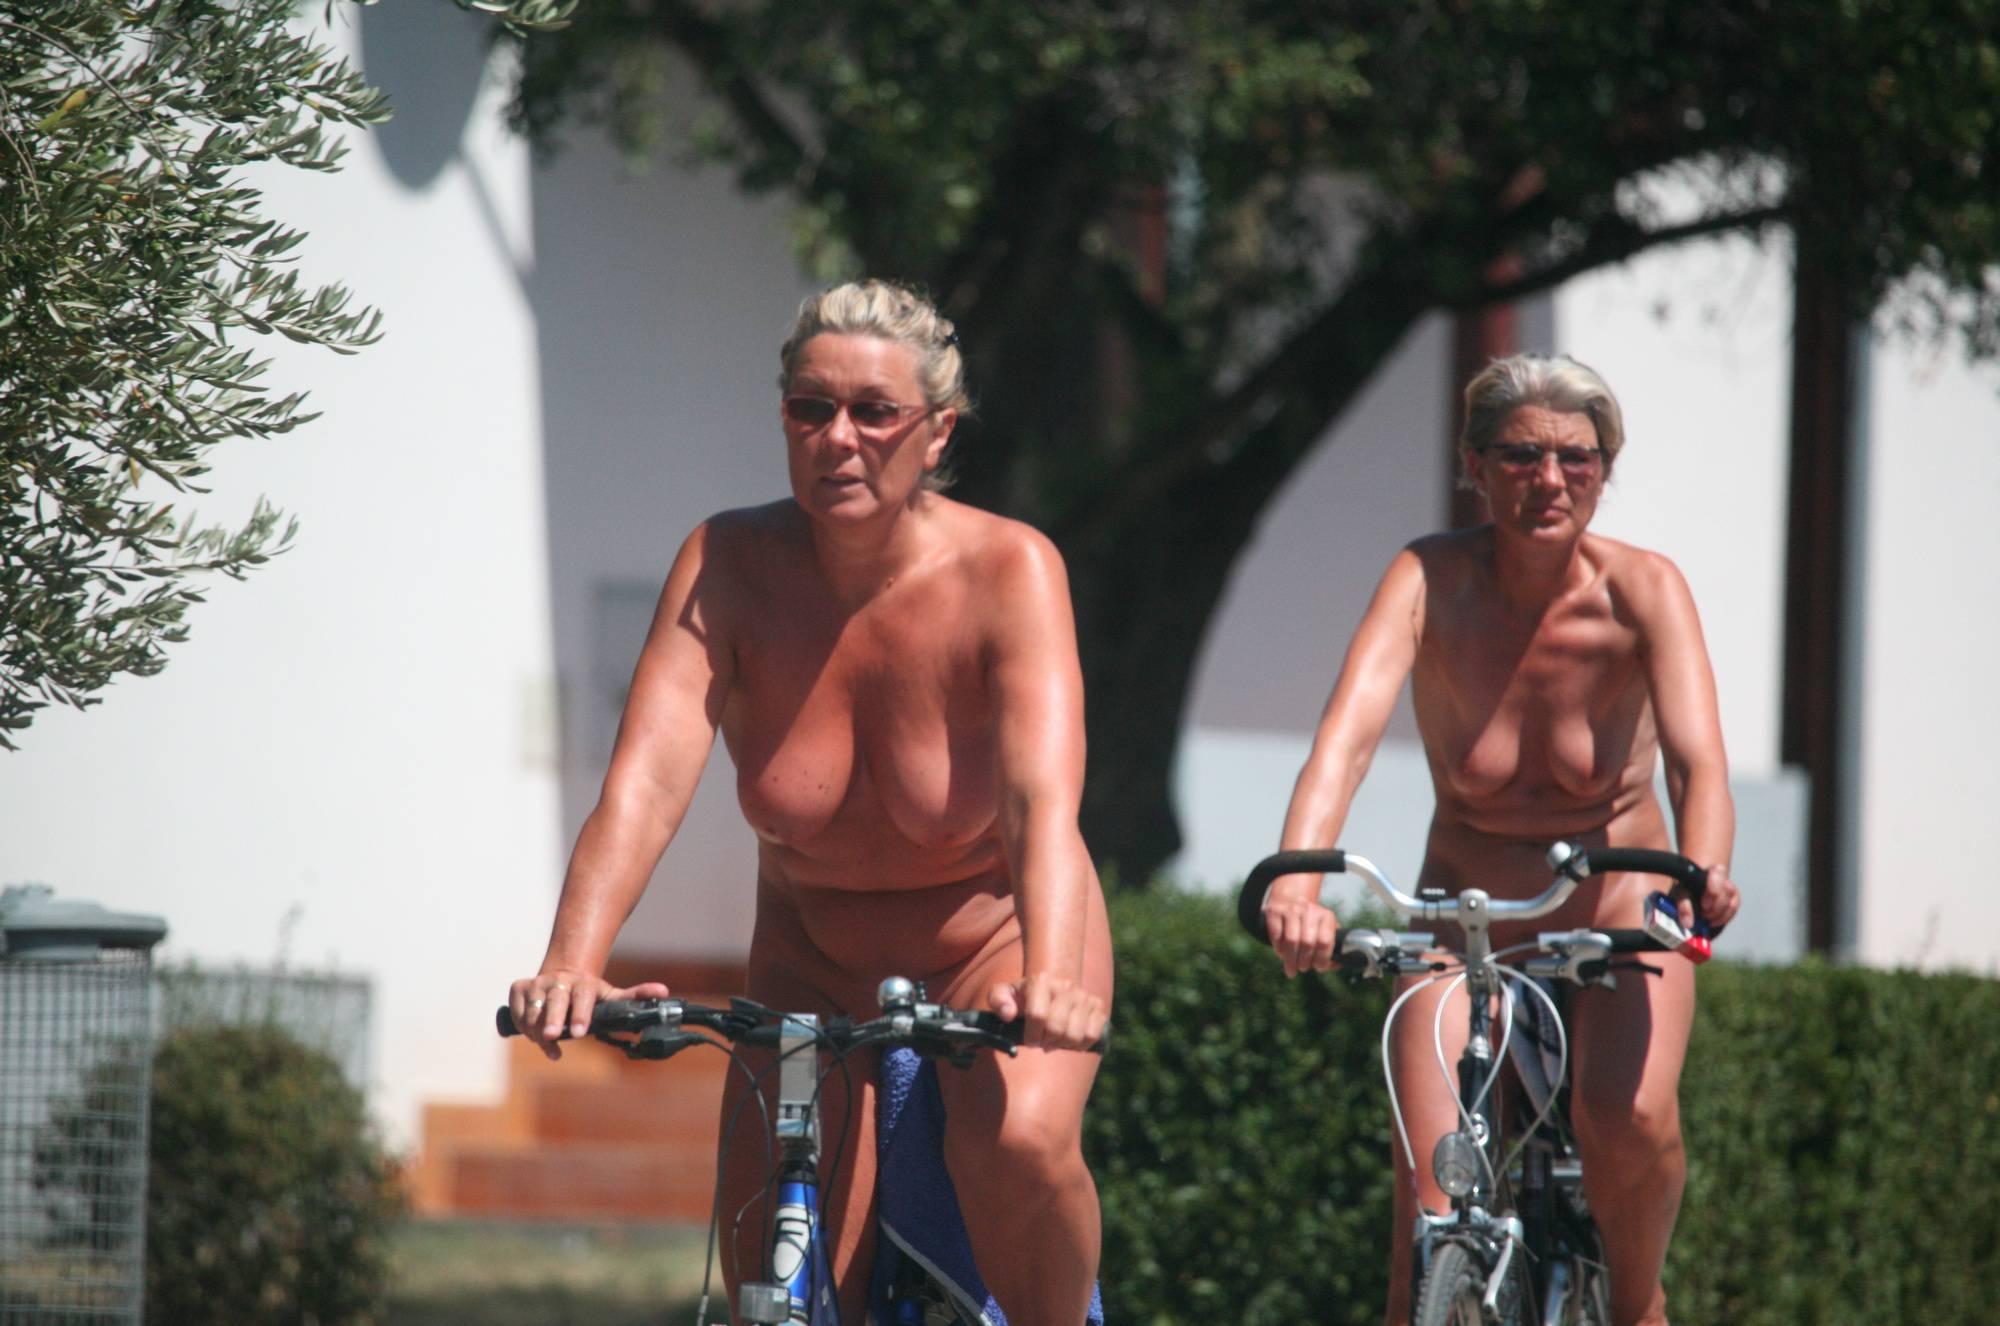 Pure Nudism-Nora FKK Road Park Biking - 4